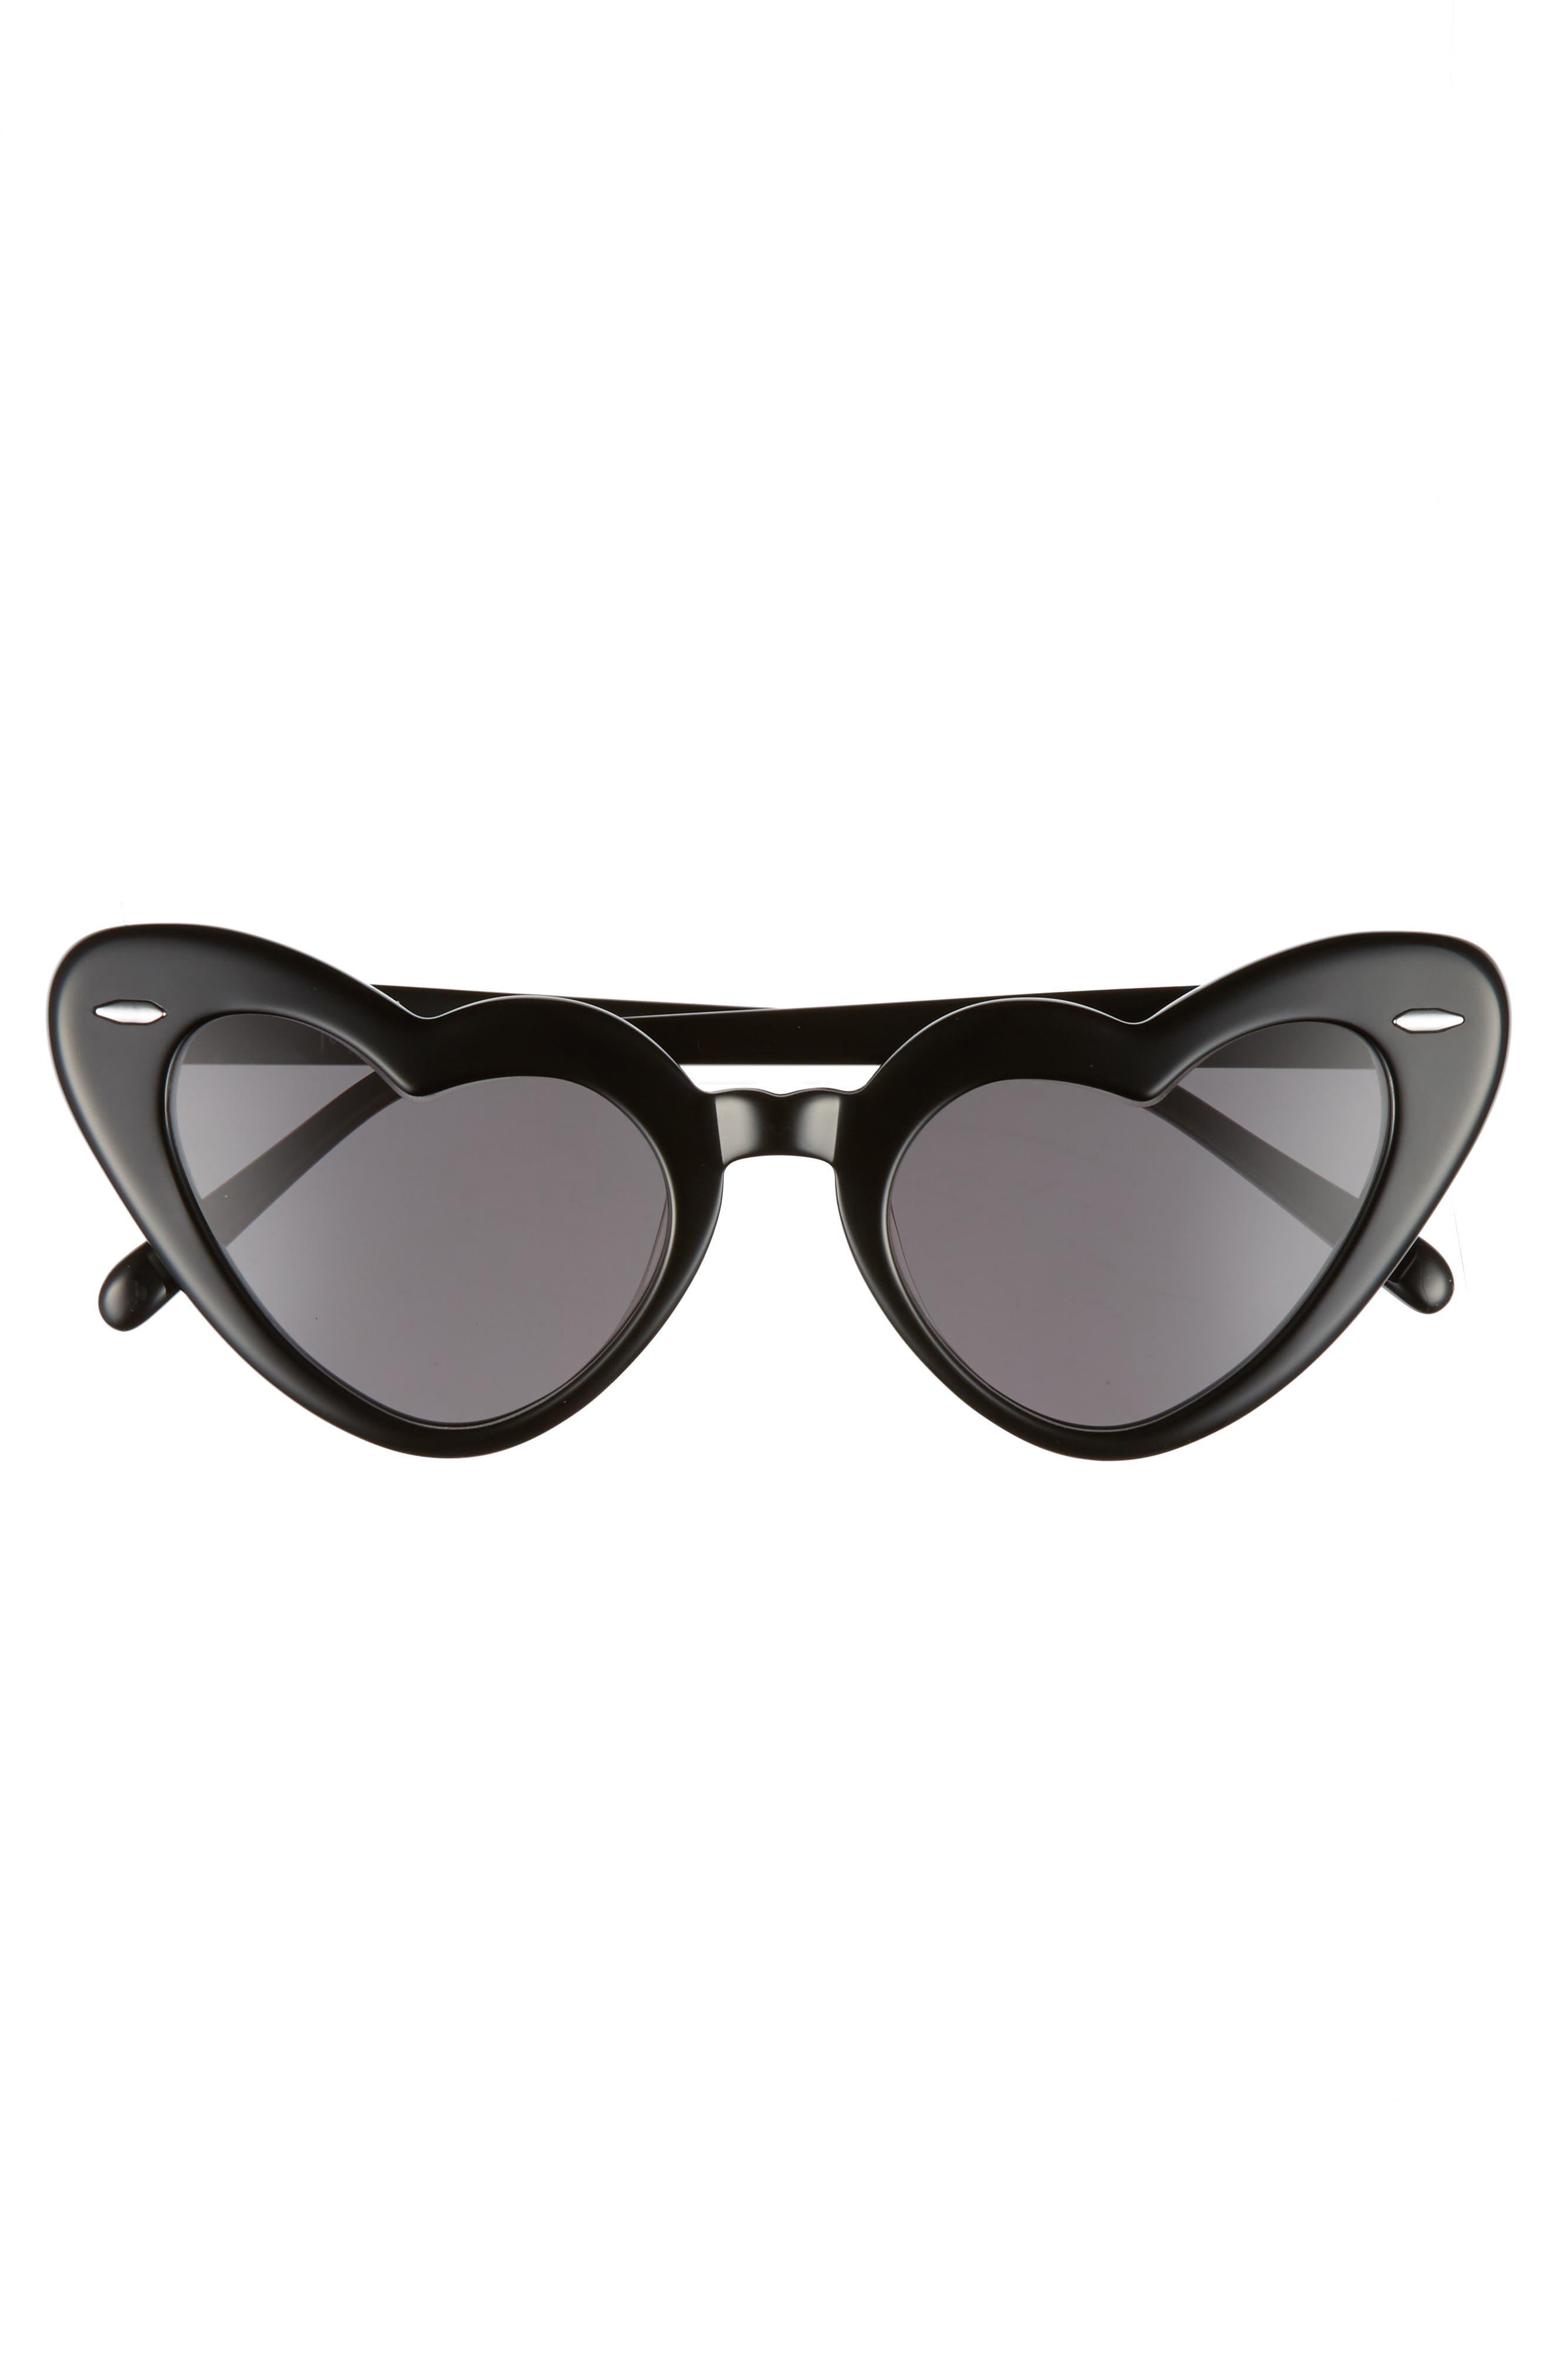 J'adore 46mm Heart Sunglasses,                             Alternate thumbnail 3, color,                             001